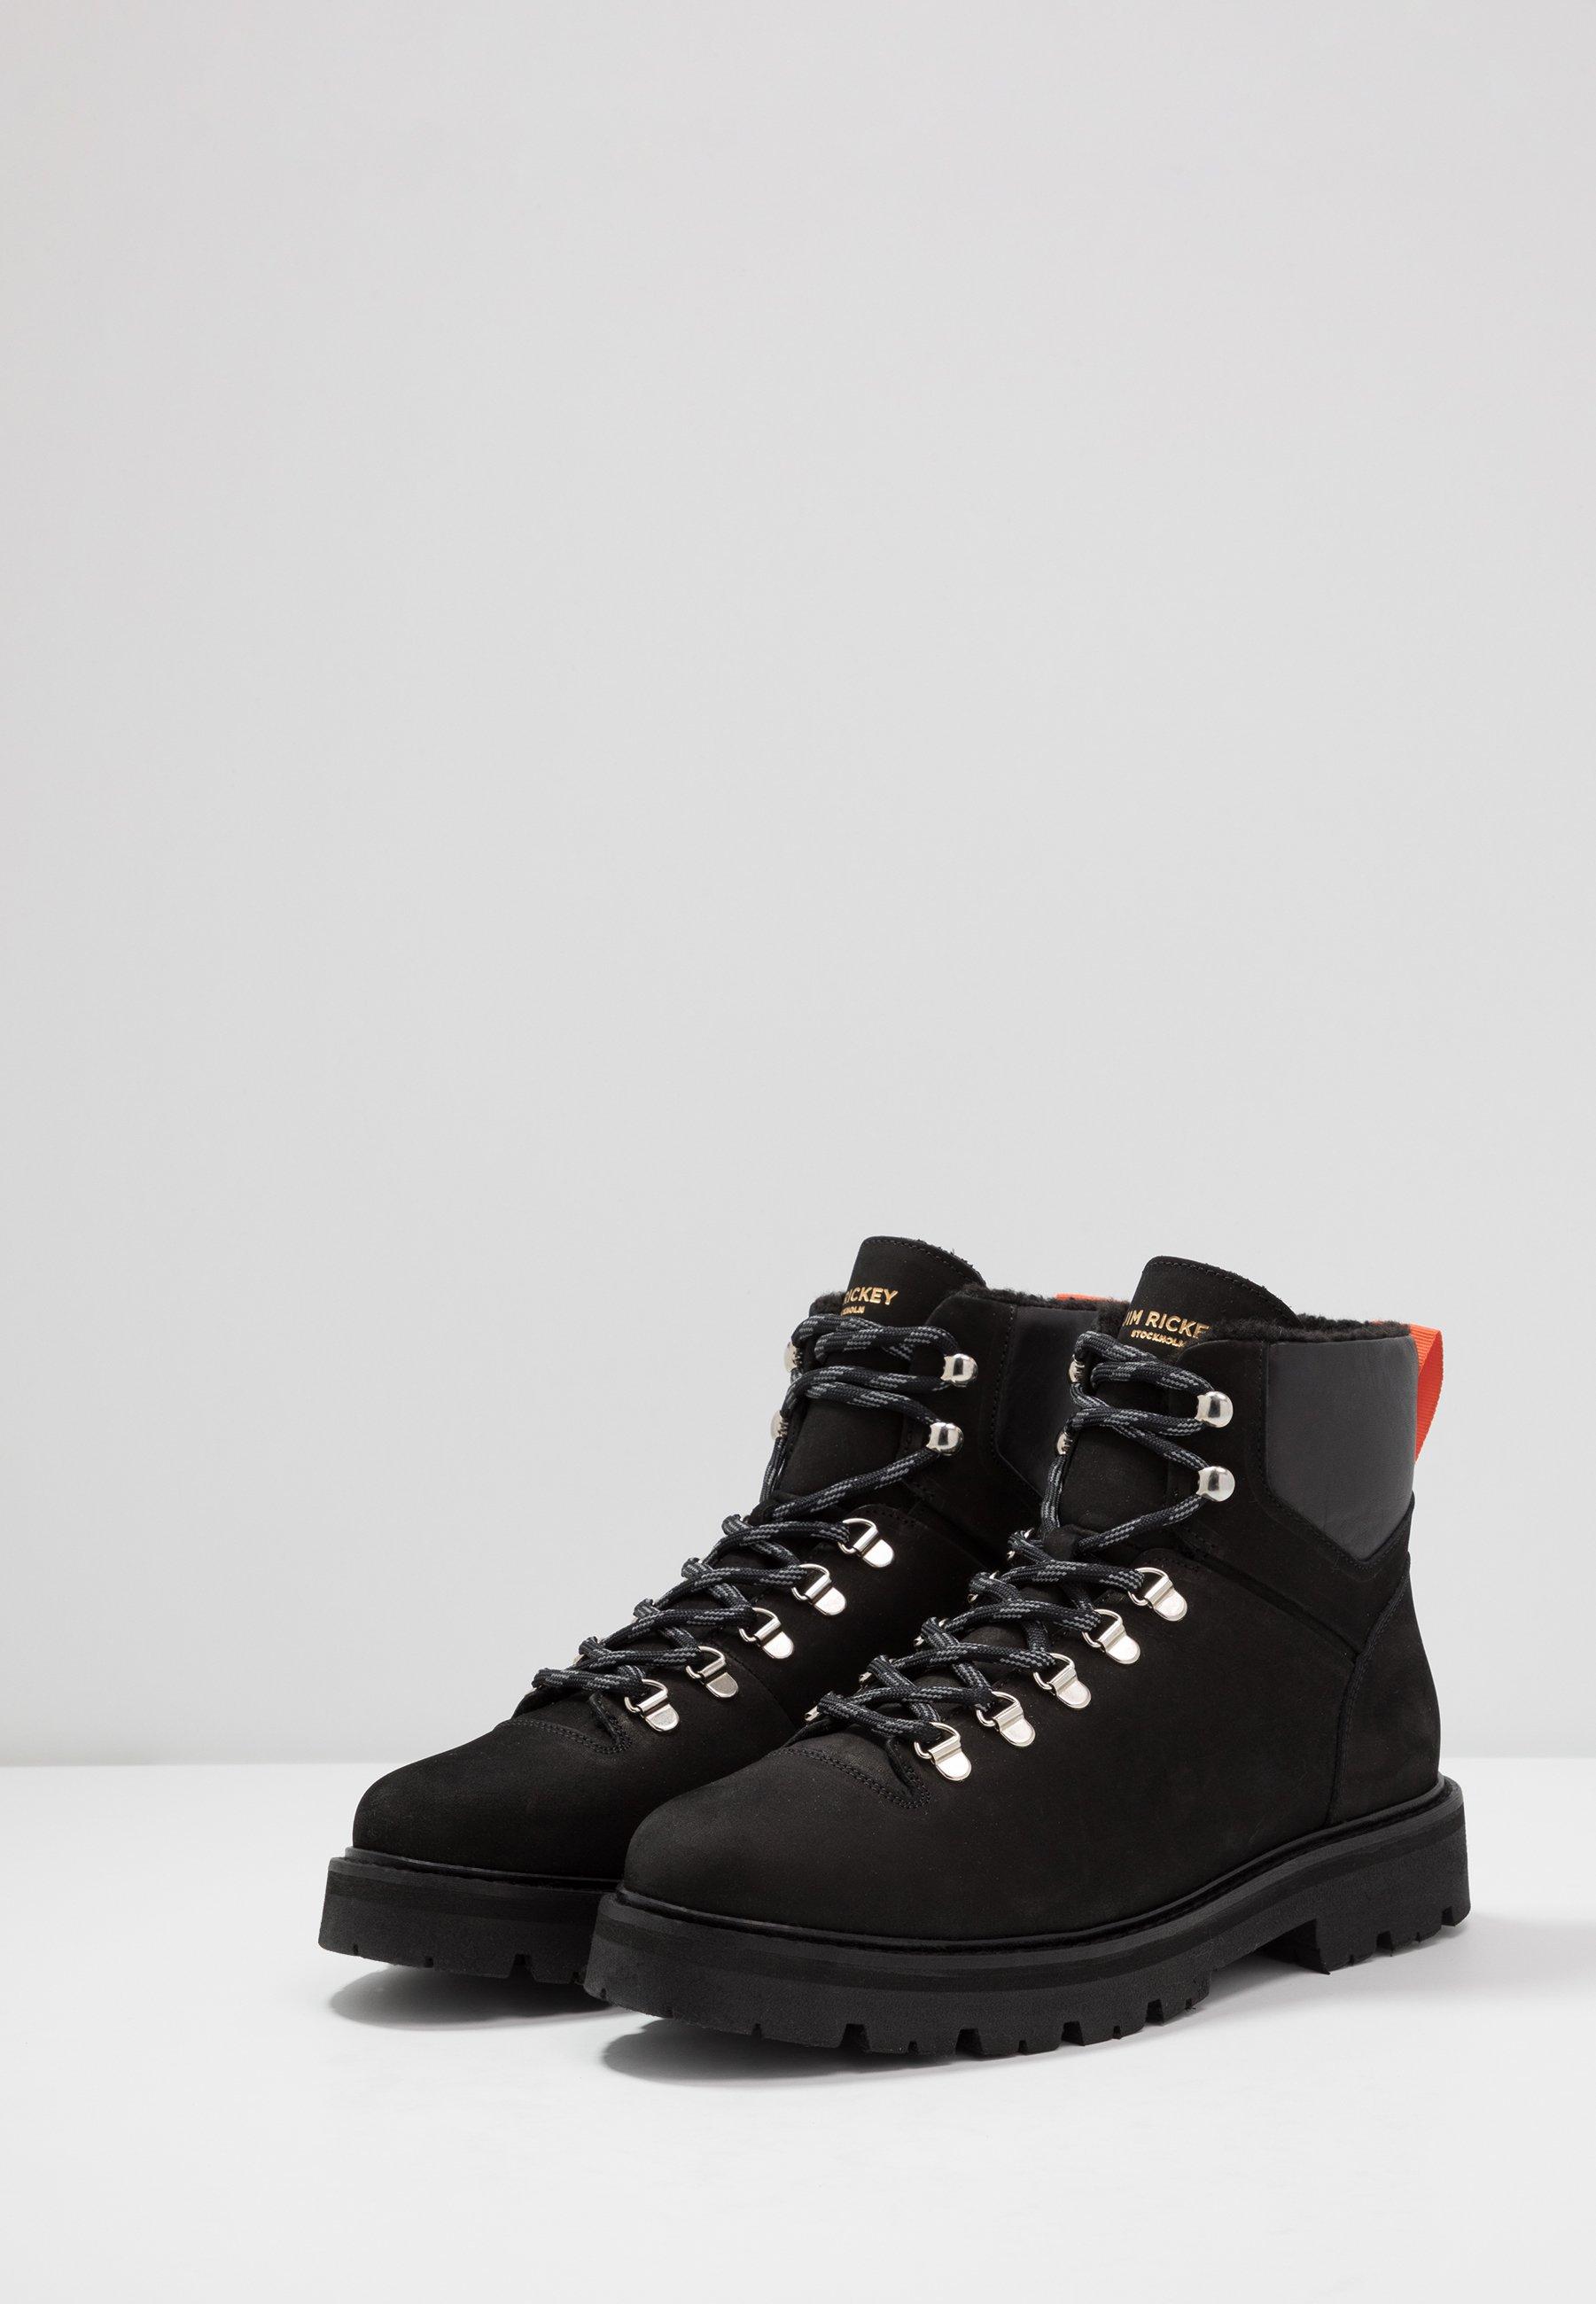 Shop For Cheapest Jim Rickey CLOUD HIKING BOOT - Lace-up ankle boots - black | men's shoes 2020 uZFjr